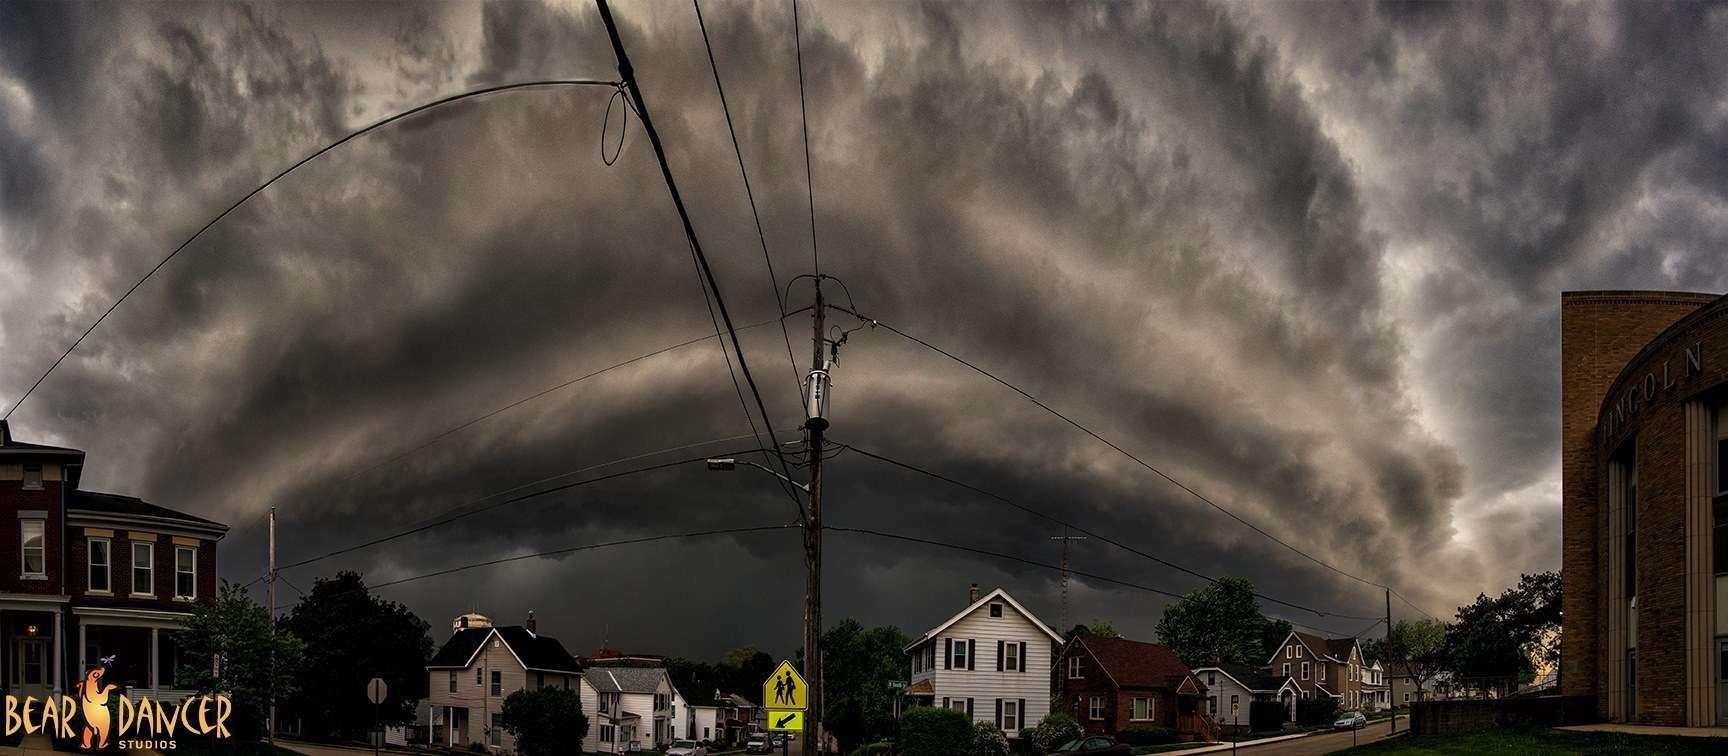 Shelf cloud over my neighborhood as a tornado warned storm came through Dubuque, IA last night.